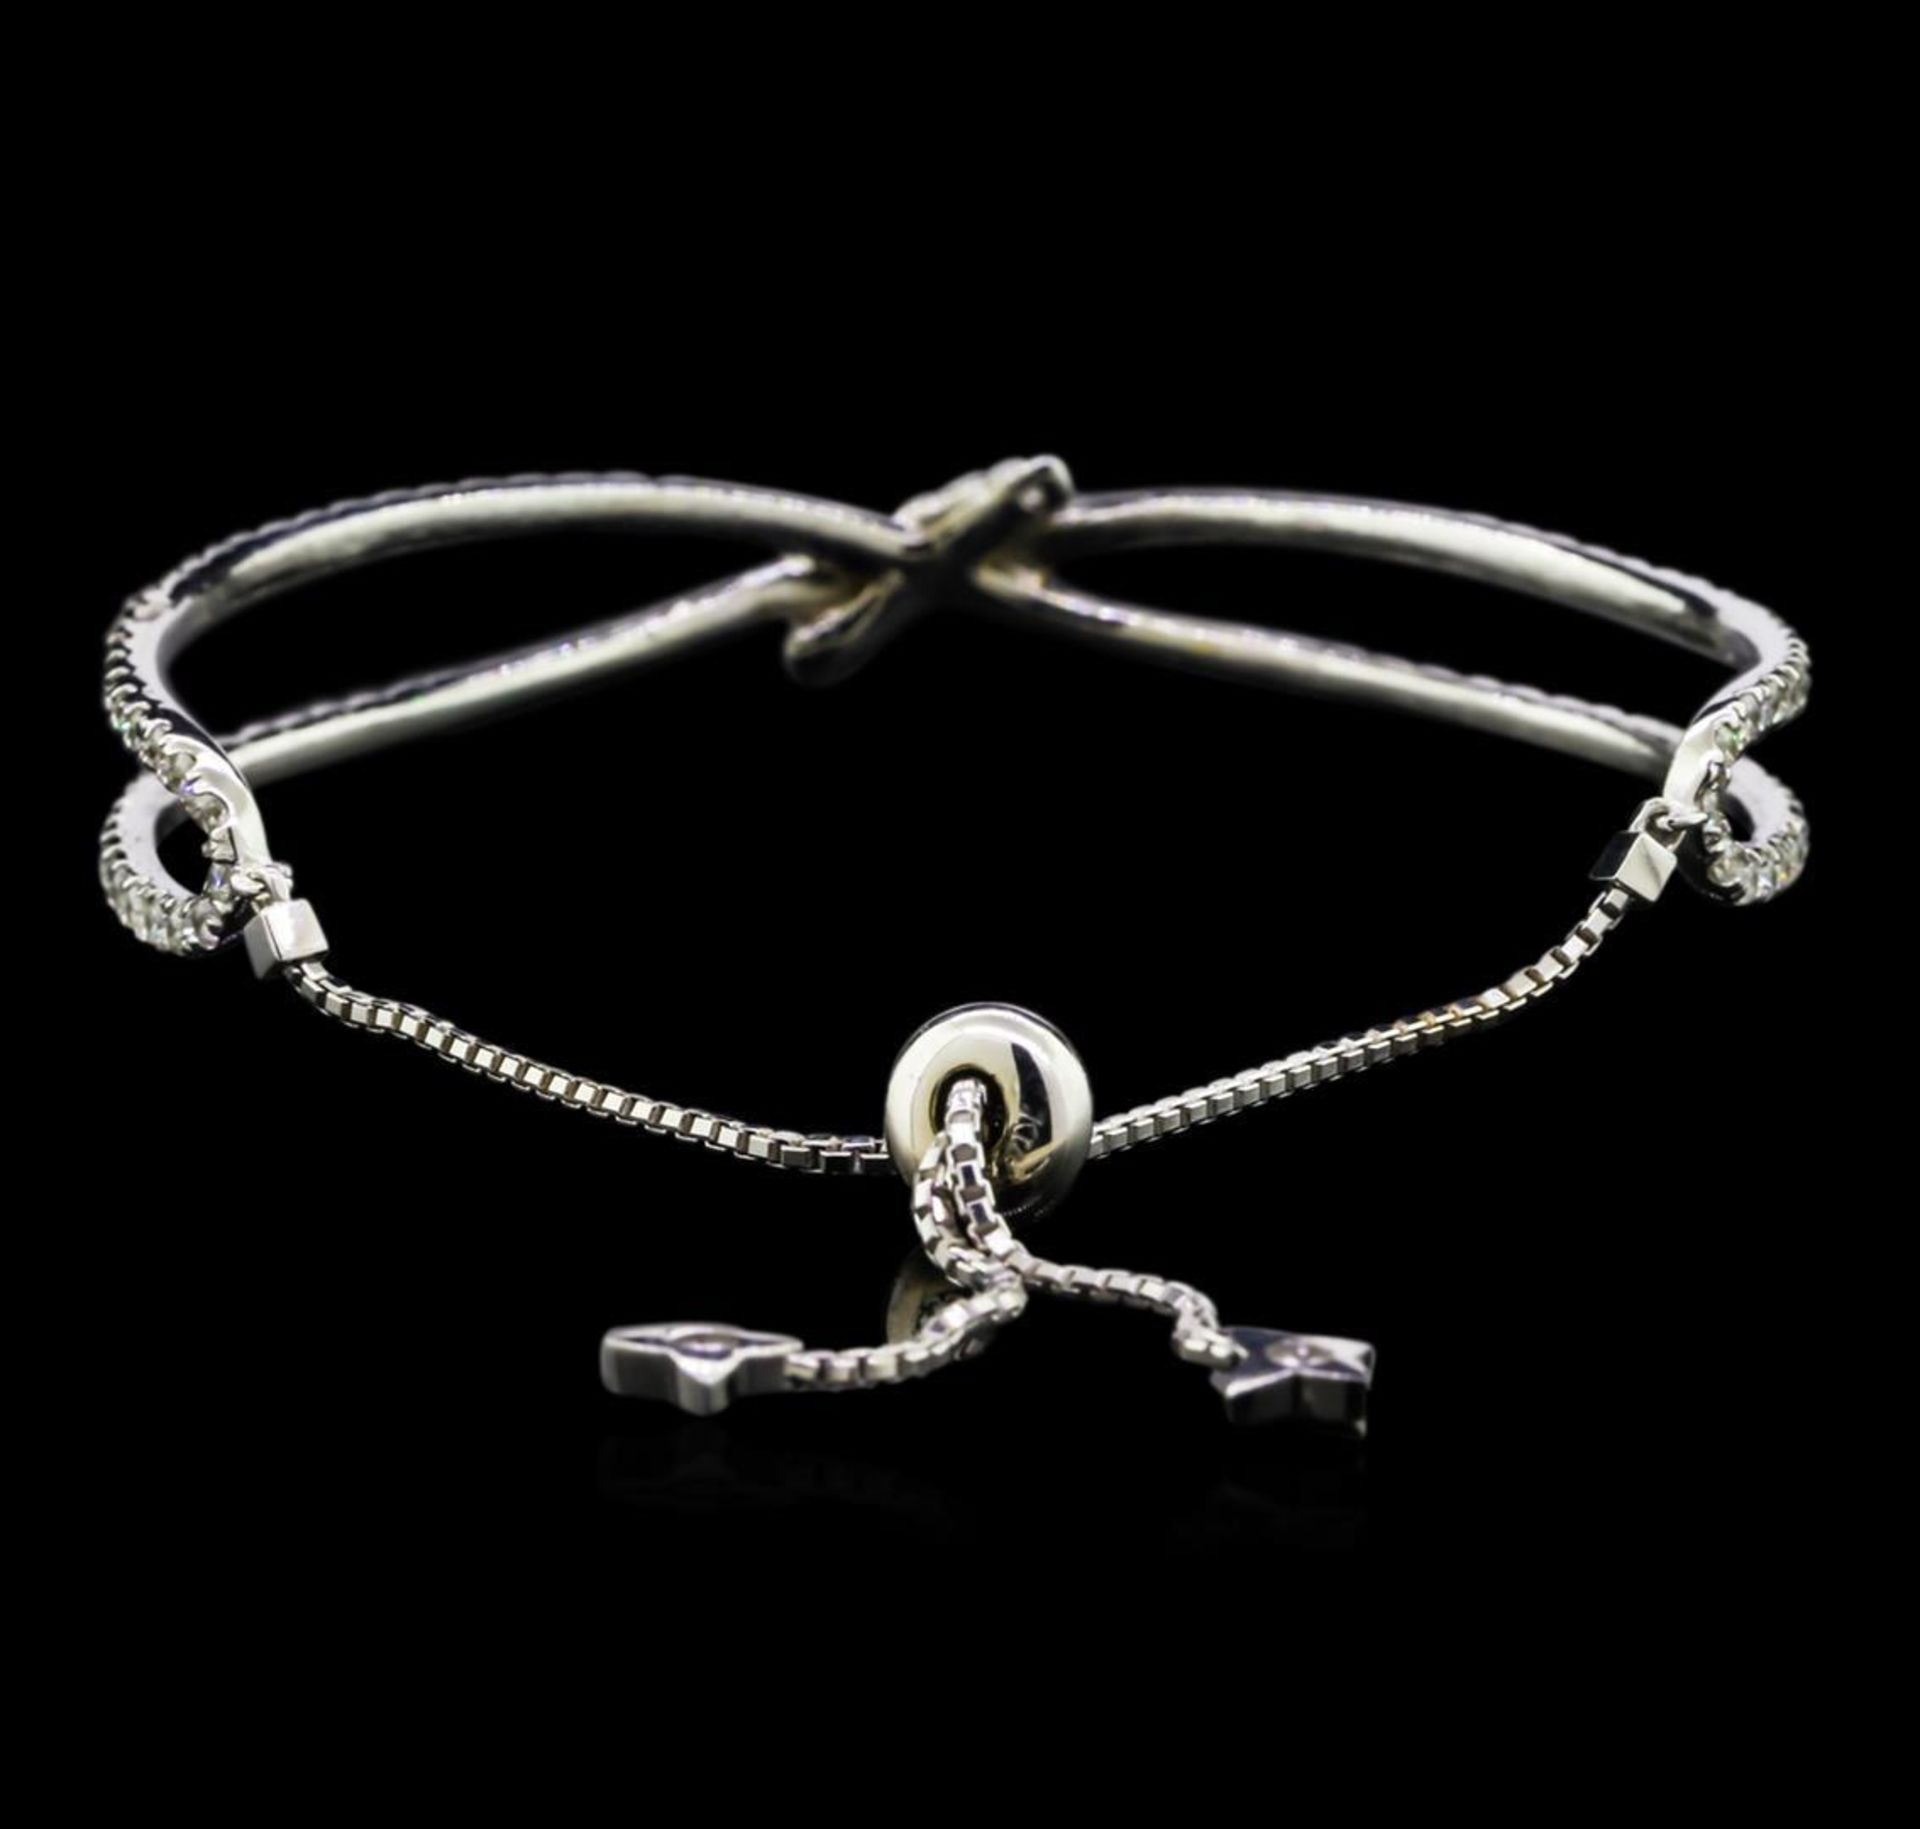 2.55 ctw Diamond Bangle Bracelet - 14KT White Gold - Image 2 of 3